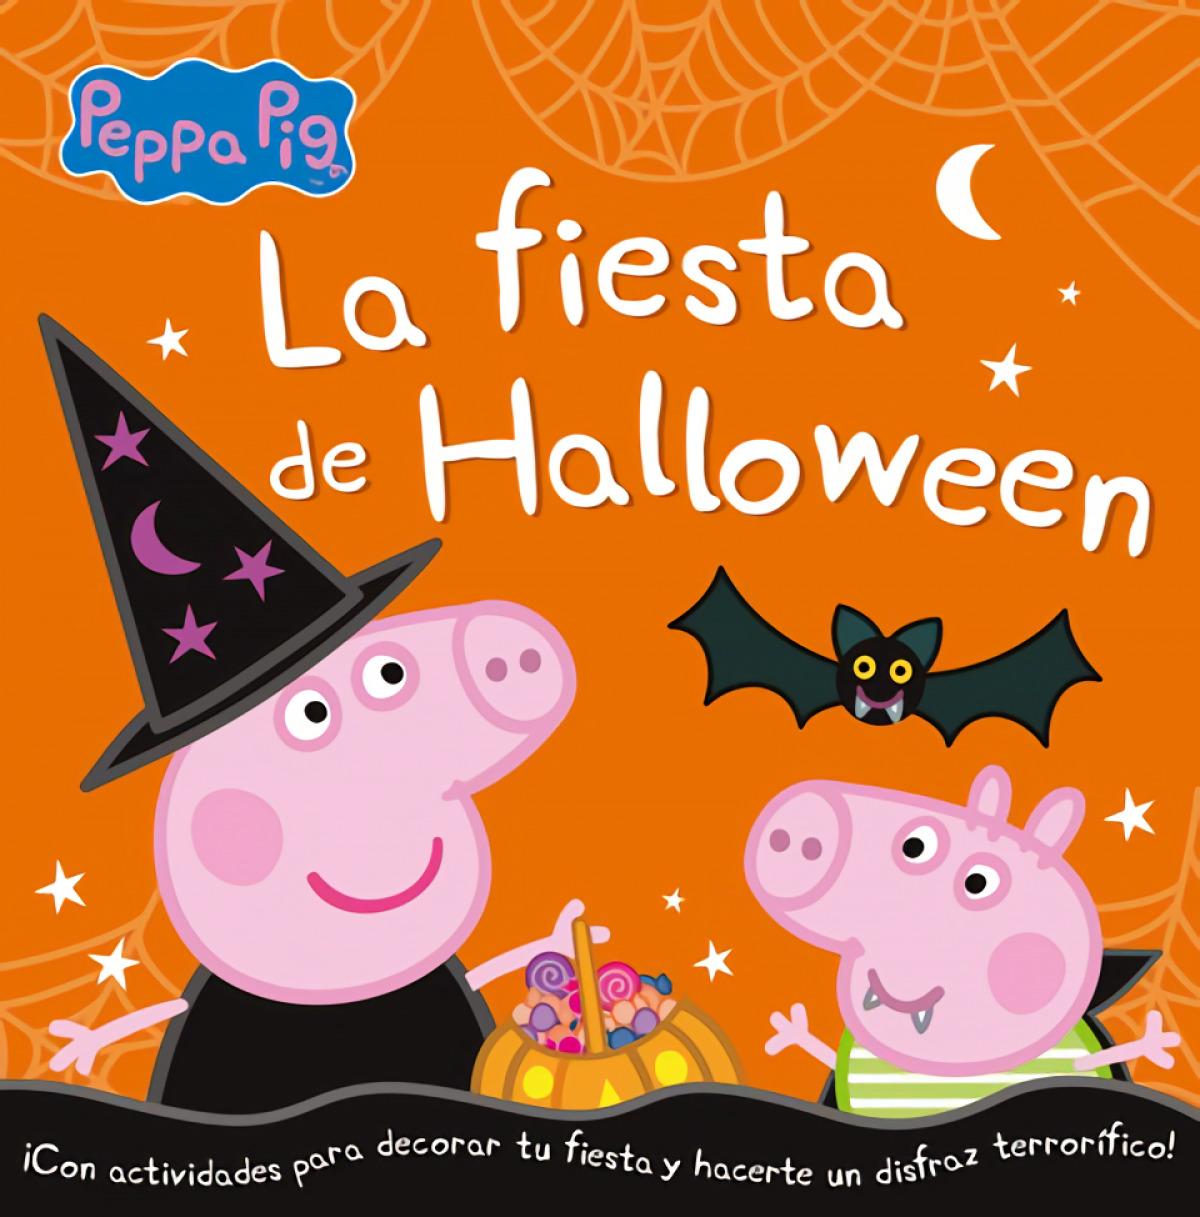 La fiesta de Halloween (Peppa Pig)